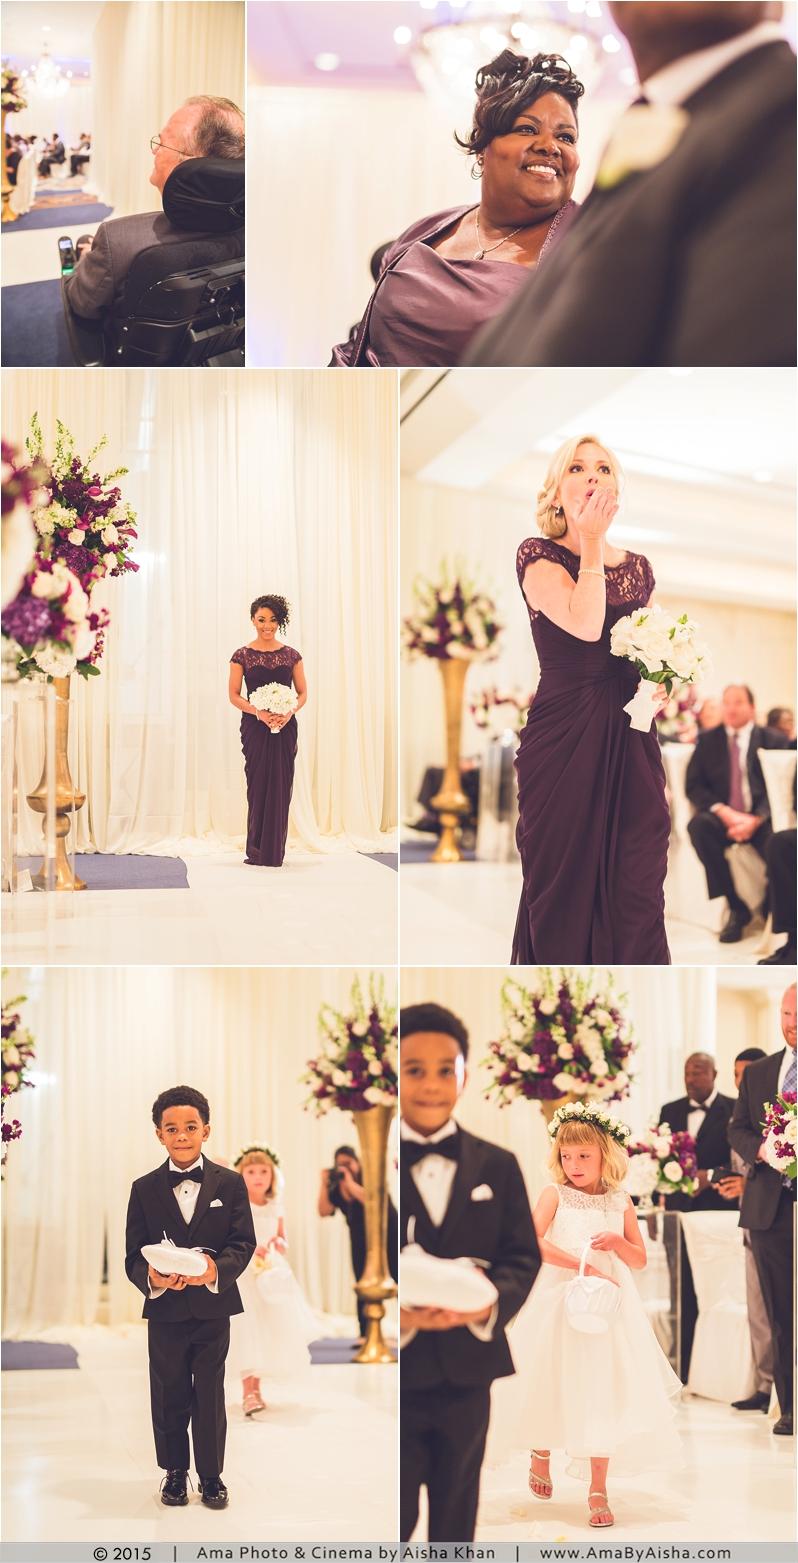 ©2015   www.AmaByAisha.com   Wedding ceremony photography